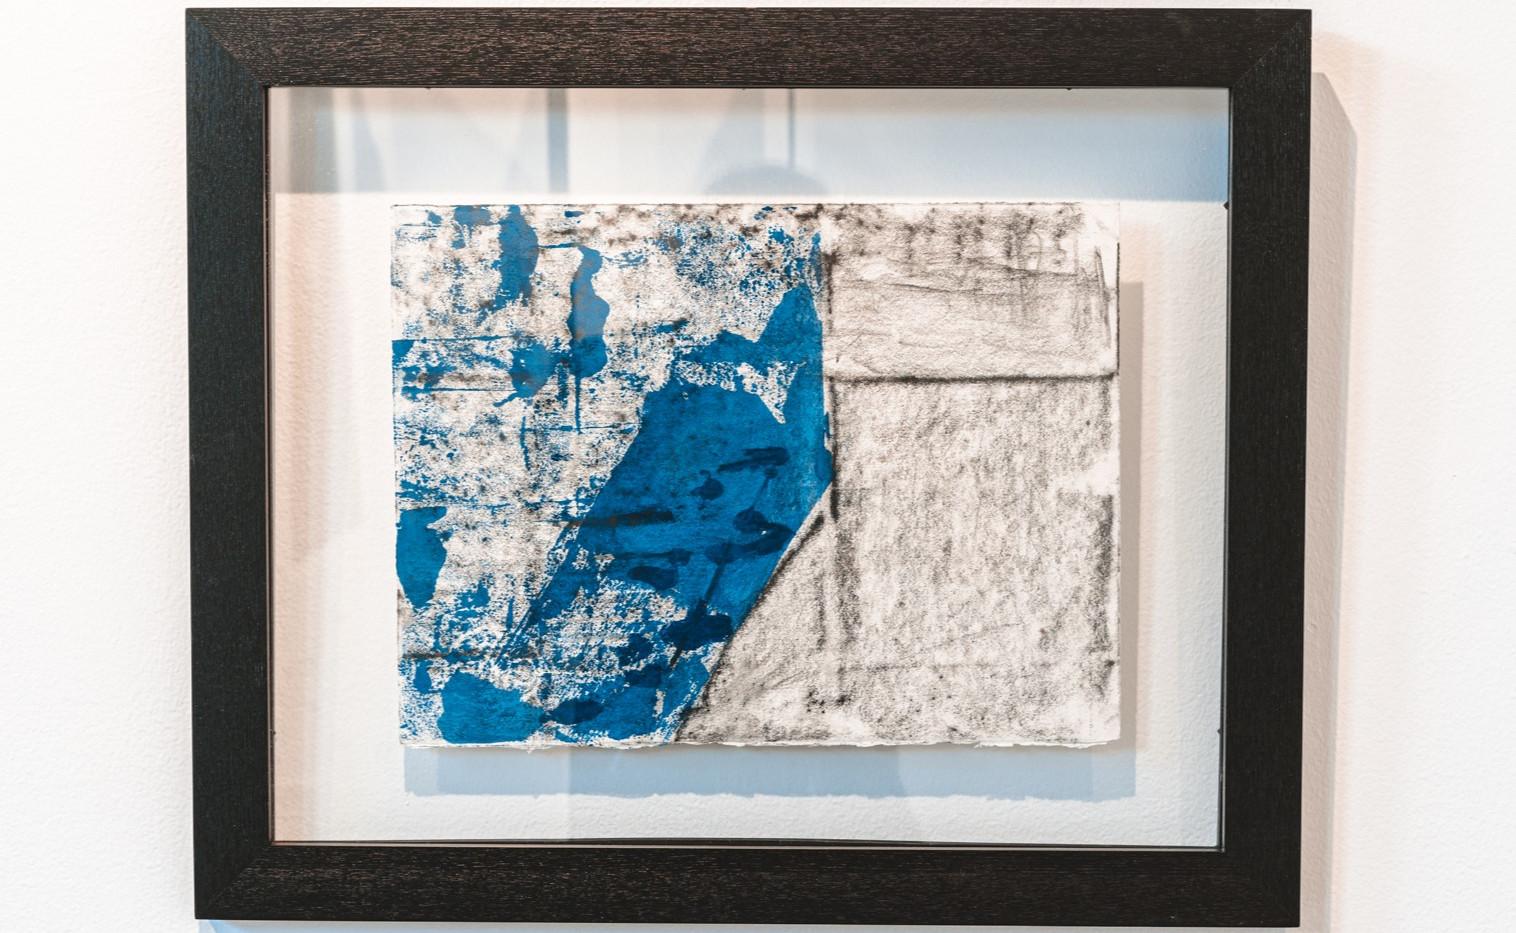 "IRA TATTELMAN  ""Alongside the Vardar River""  Monoprint on Fabriano Tiepolo paper 18.75"" x 22.75"" framed 2019 $425  Photograph by StereoVision"